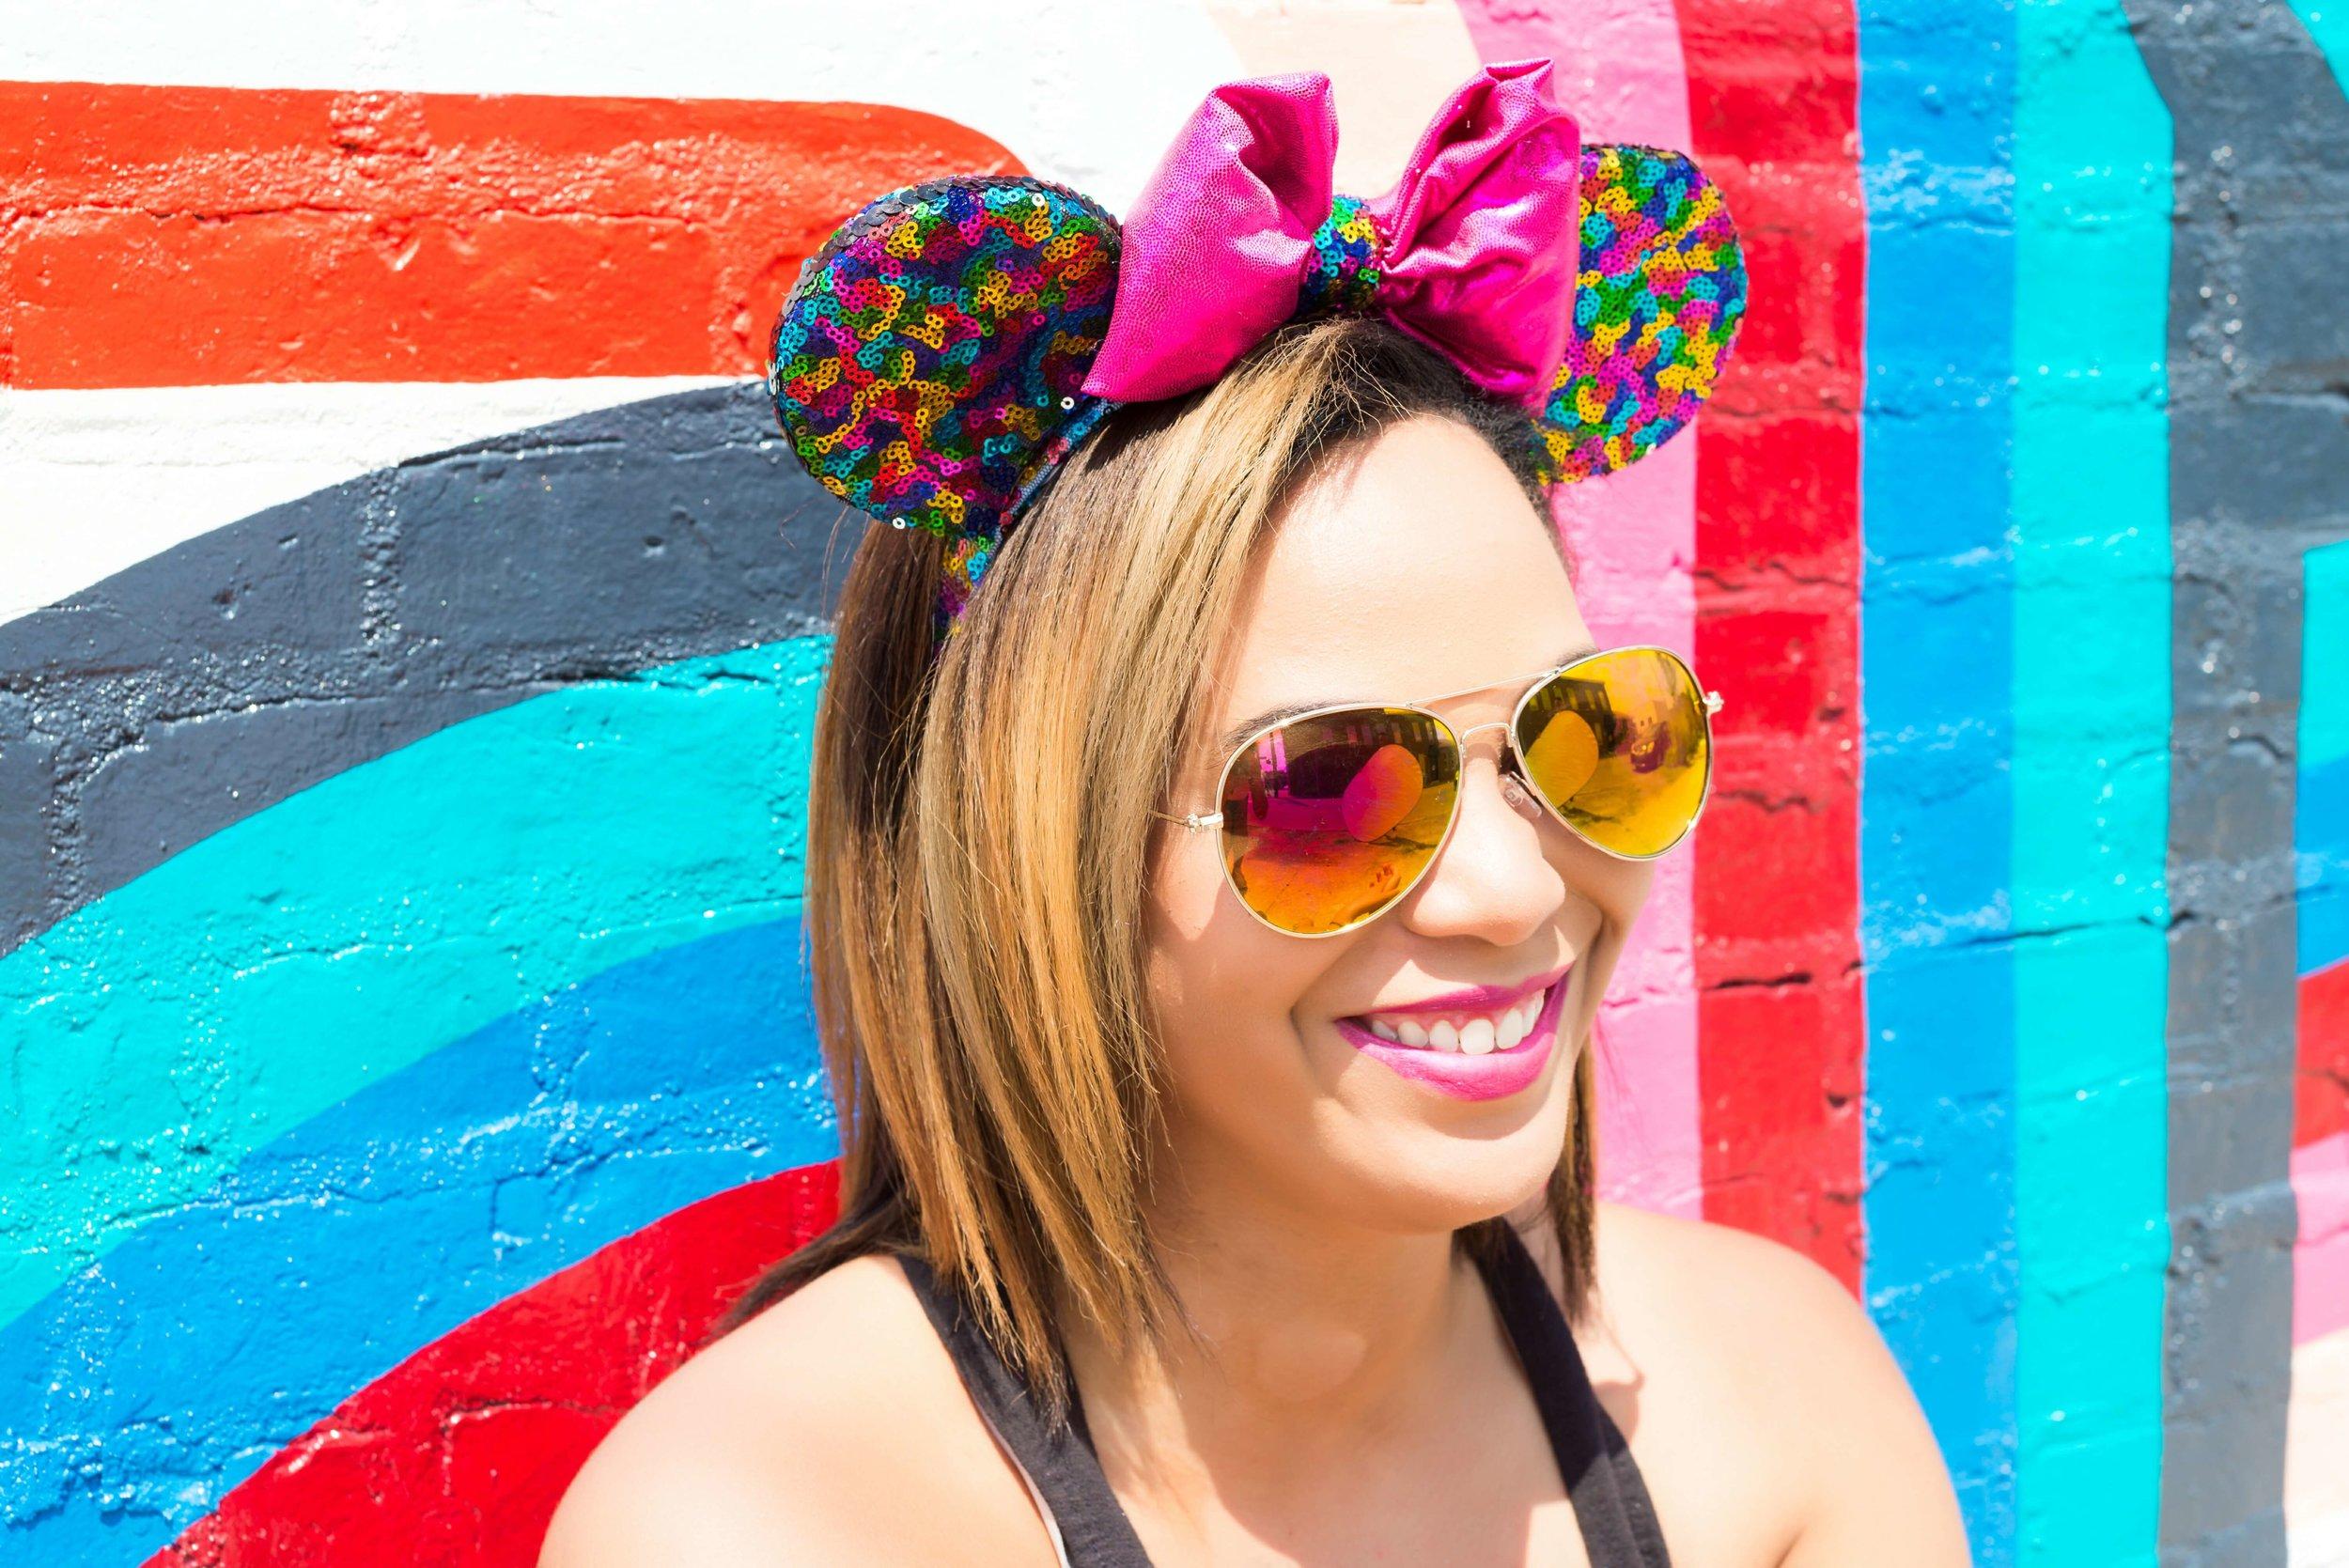 Chanel Nicole _ Louisville Photographer touche -Disney blogger.jpg